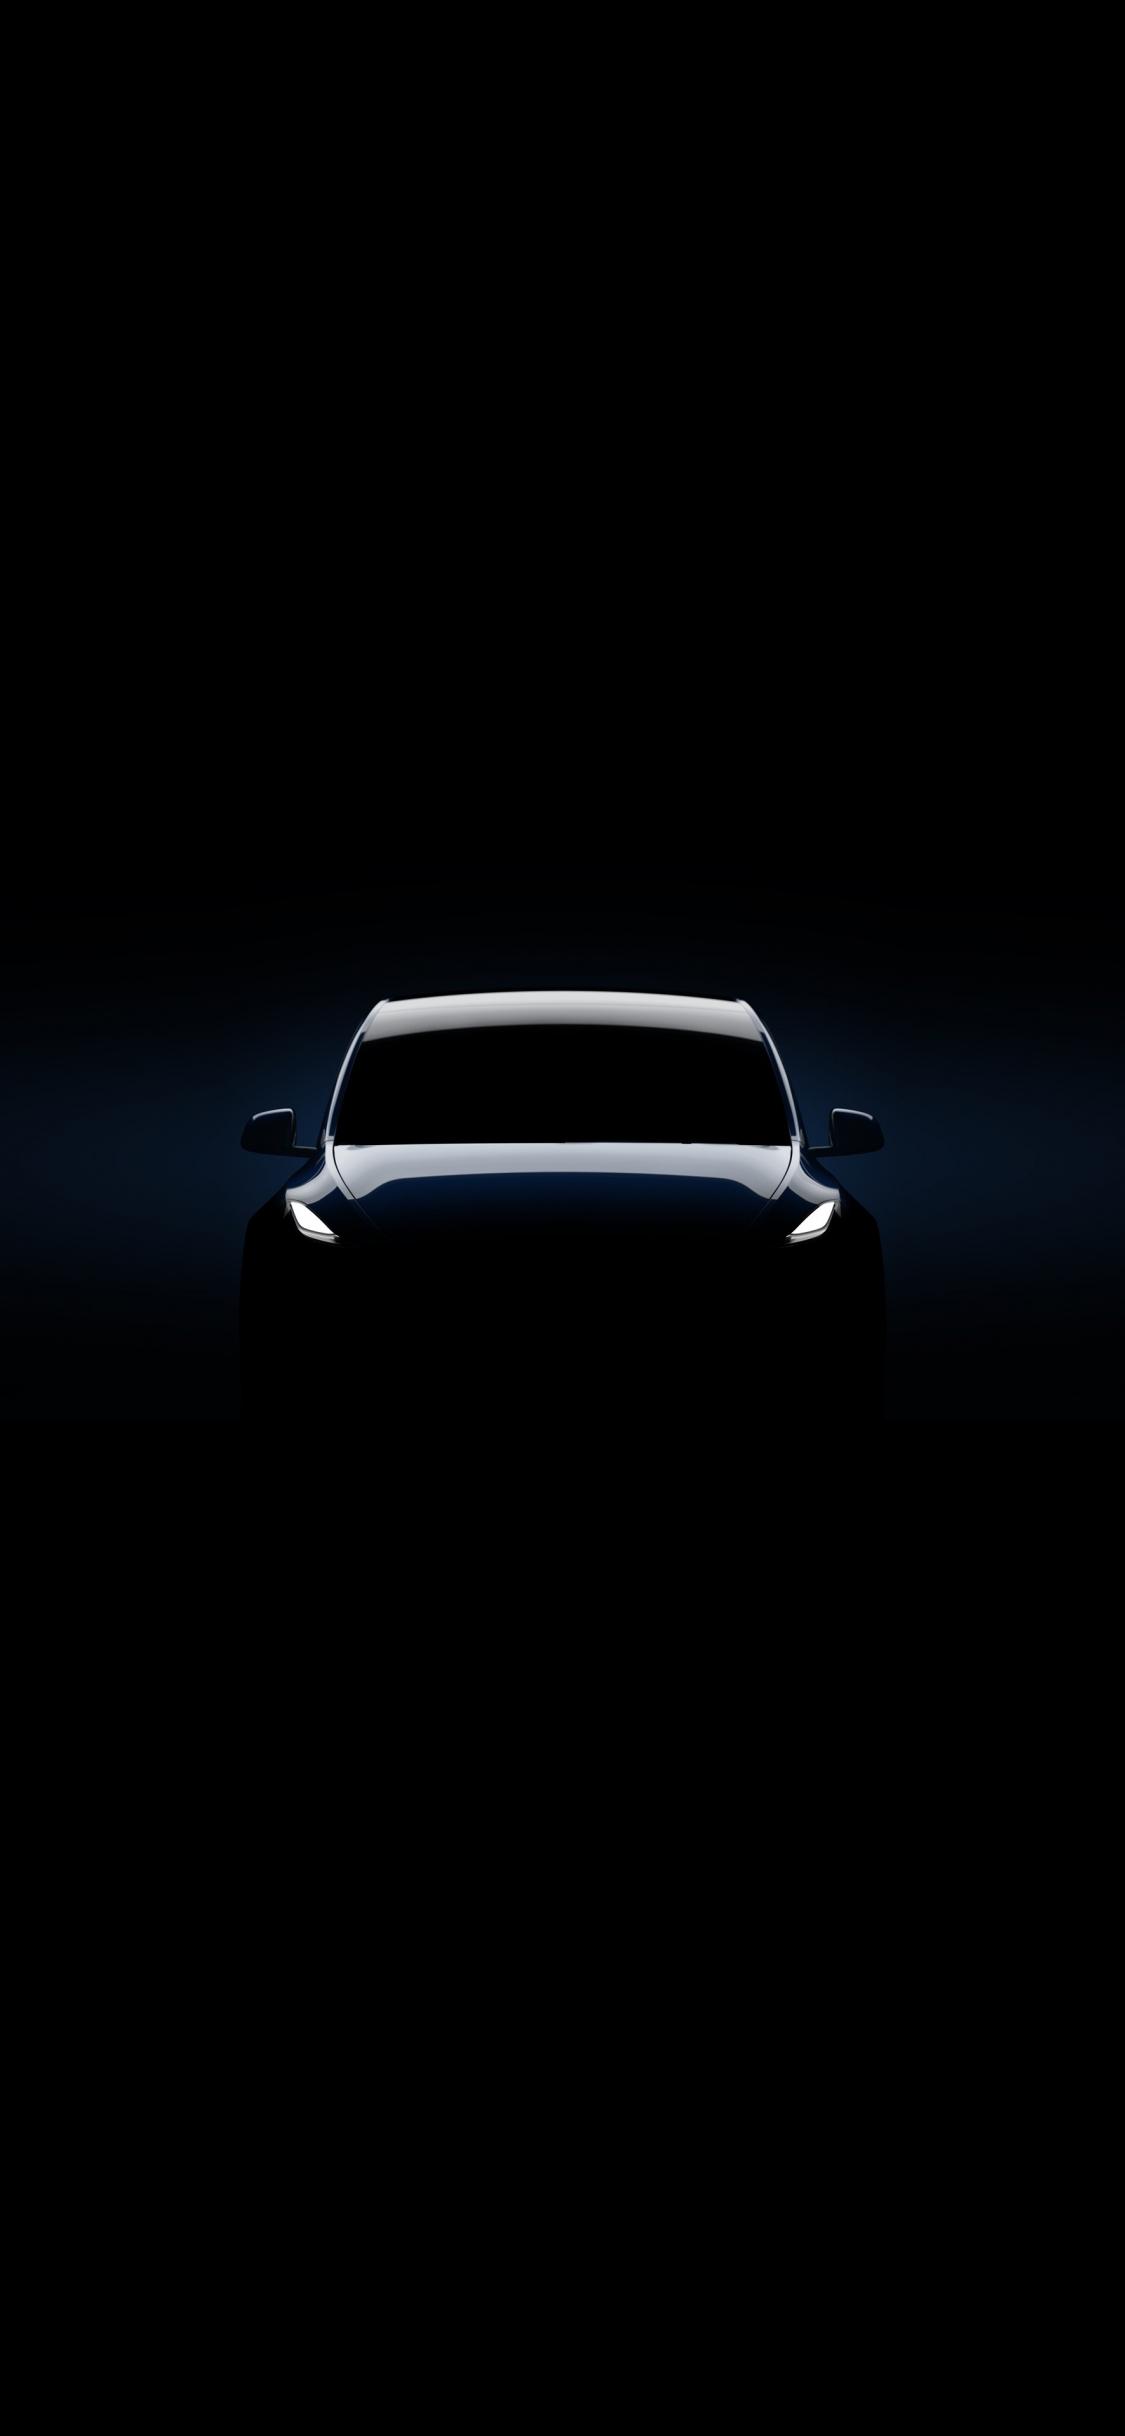 Download 1125x2436 Wallpaper 2019 Tesla Model Y Dark